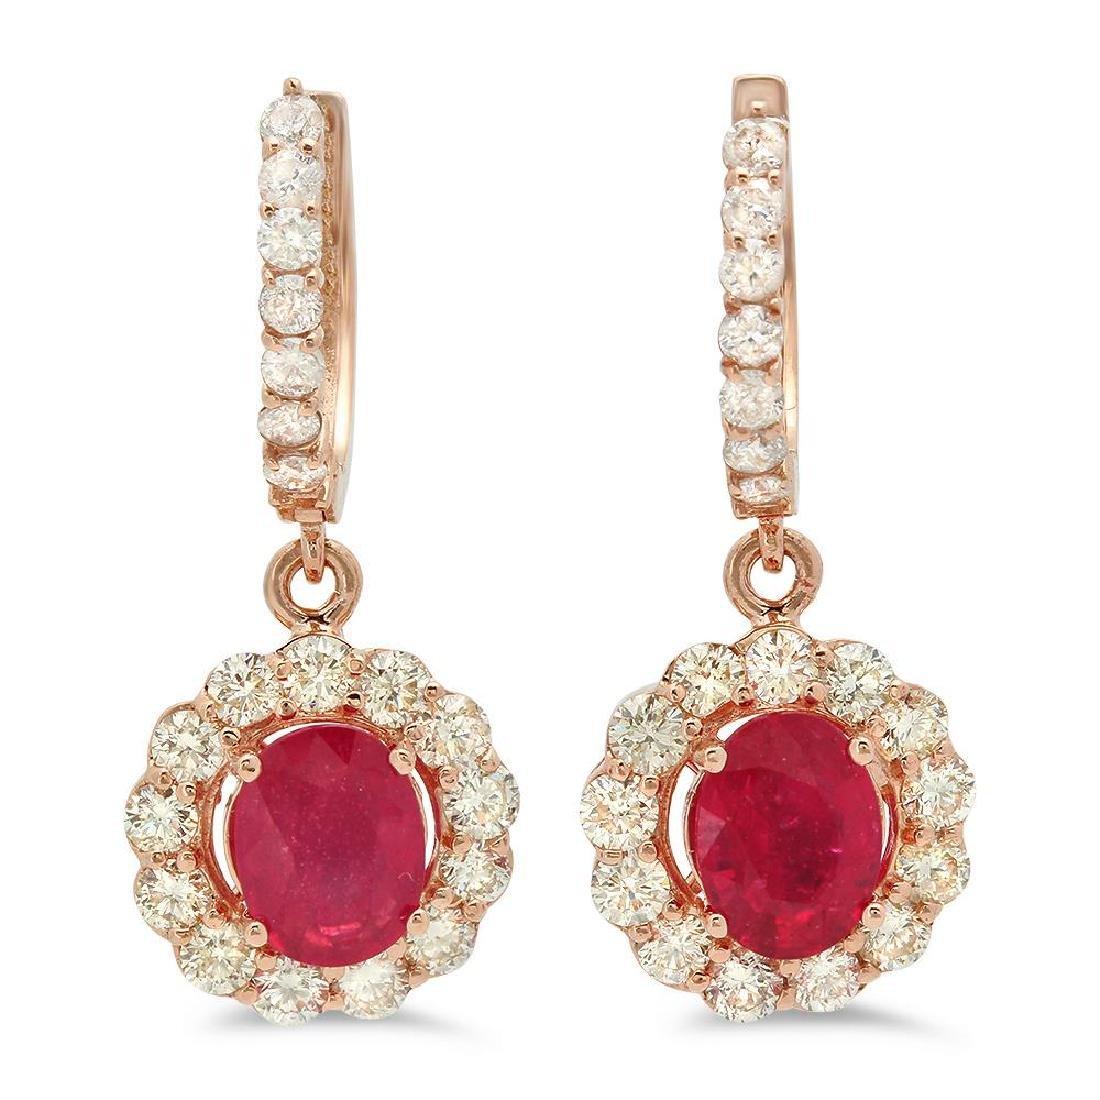 14K Gold 2.97ct Ruby 2.15cts Diamond Earrings